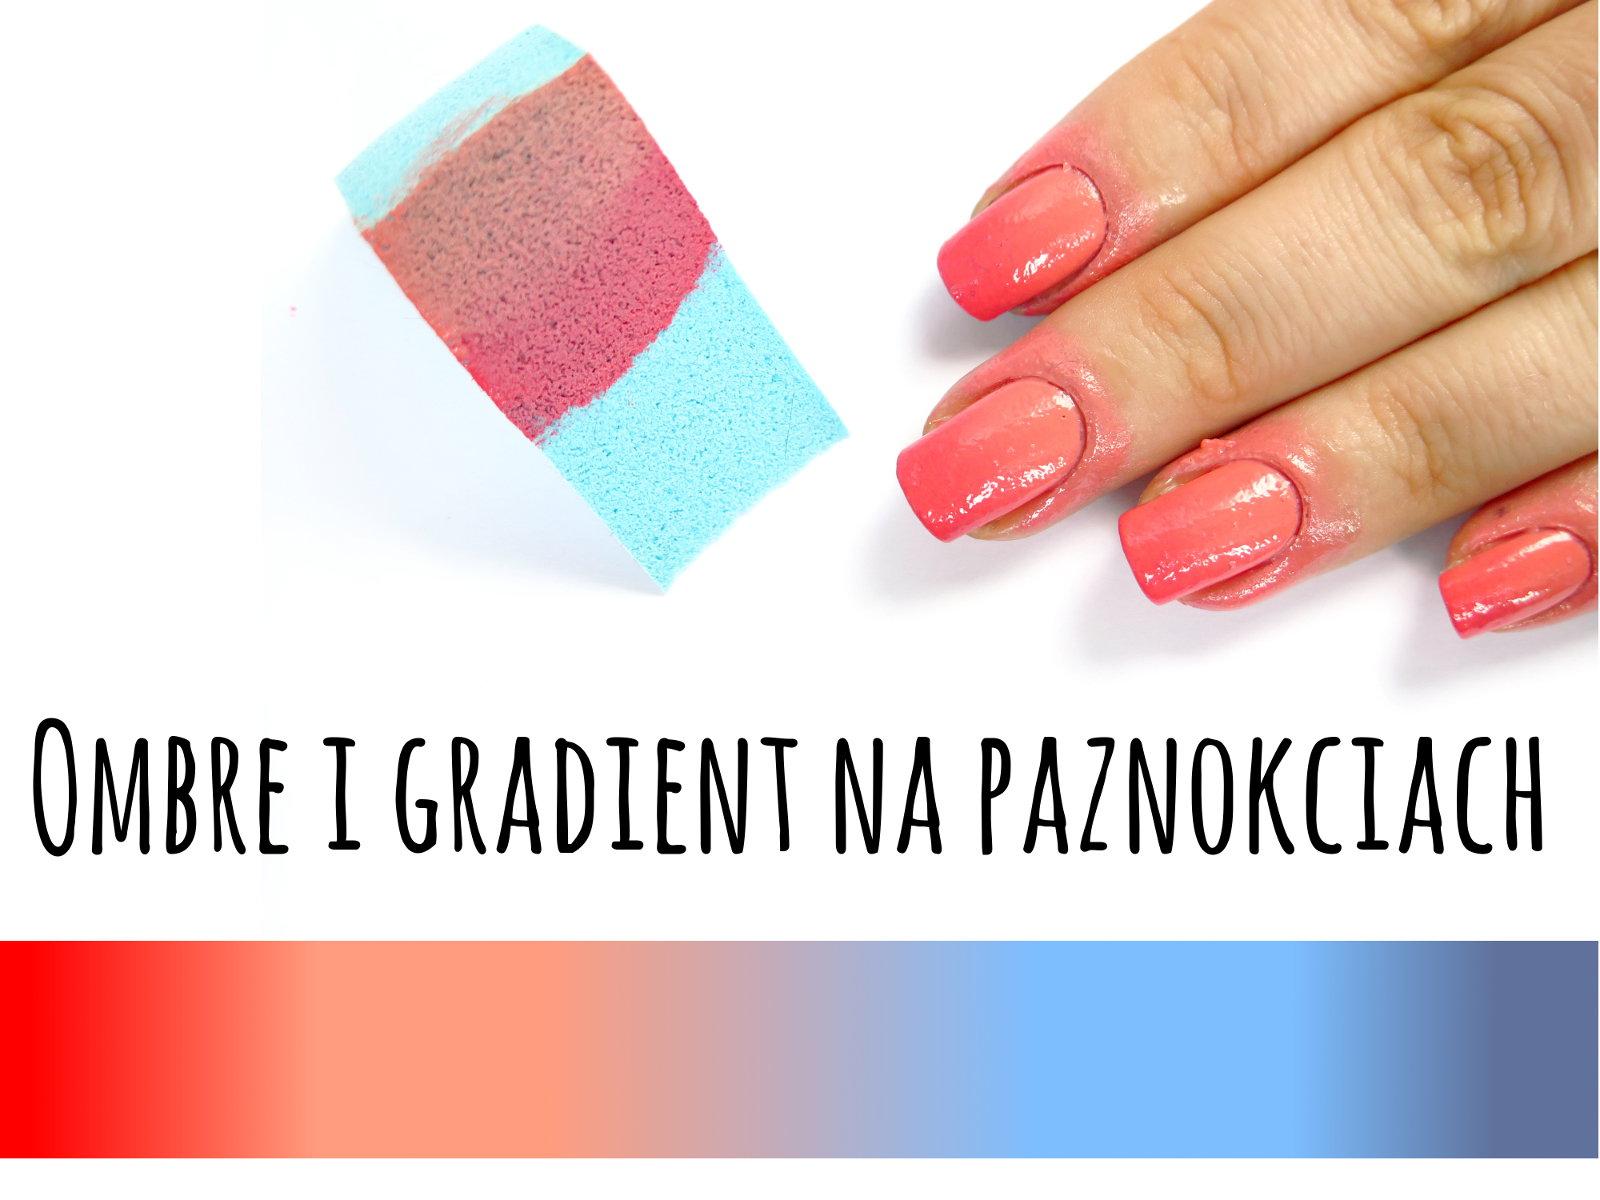 <h1>Ombre i gradient na paznokciach na kilka sposobów – wskazówki i videotutoriale</h1>